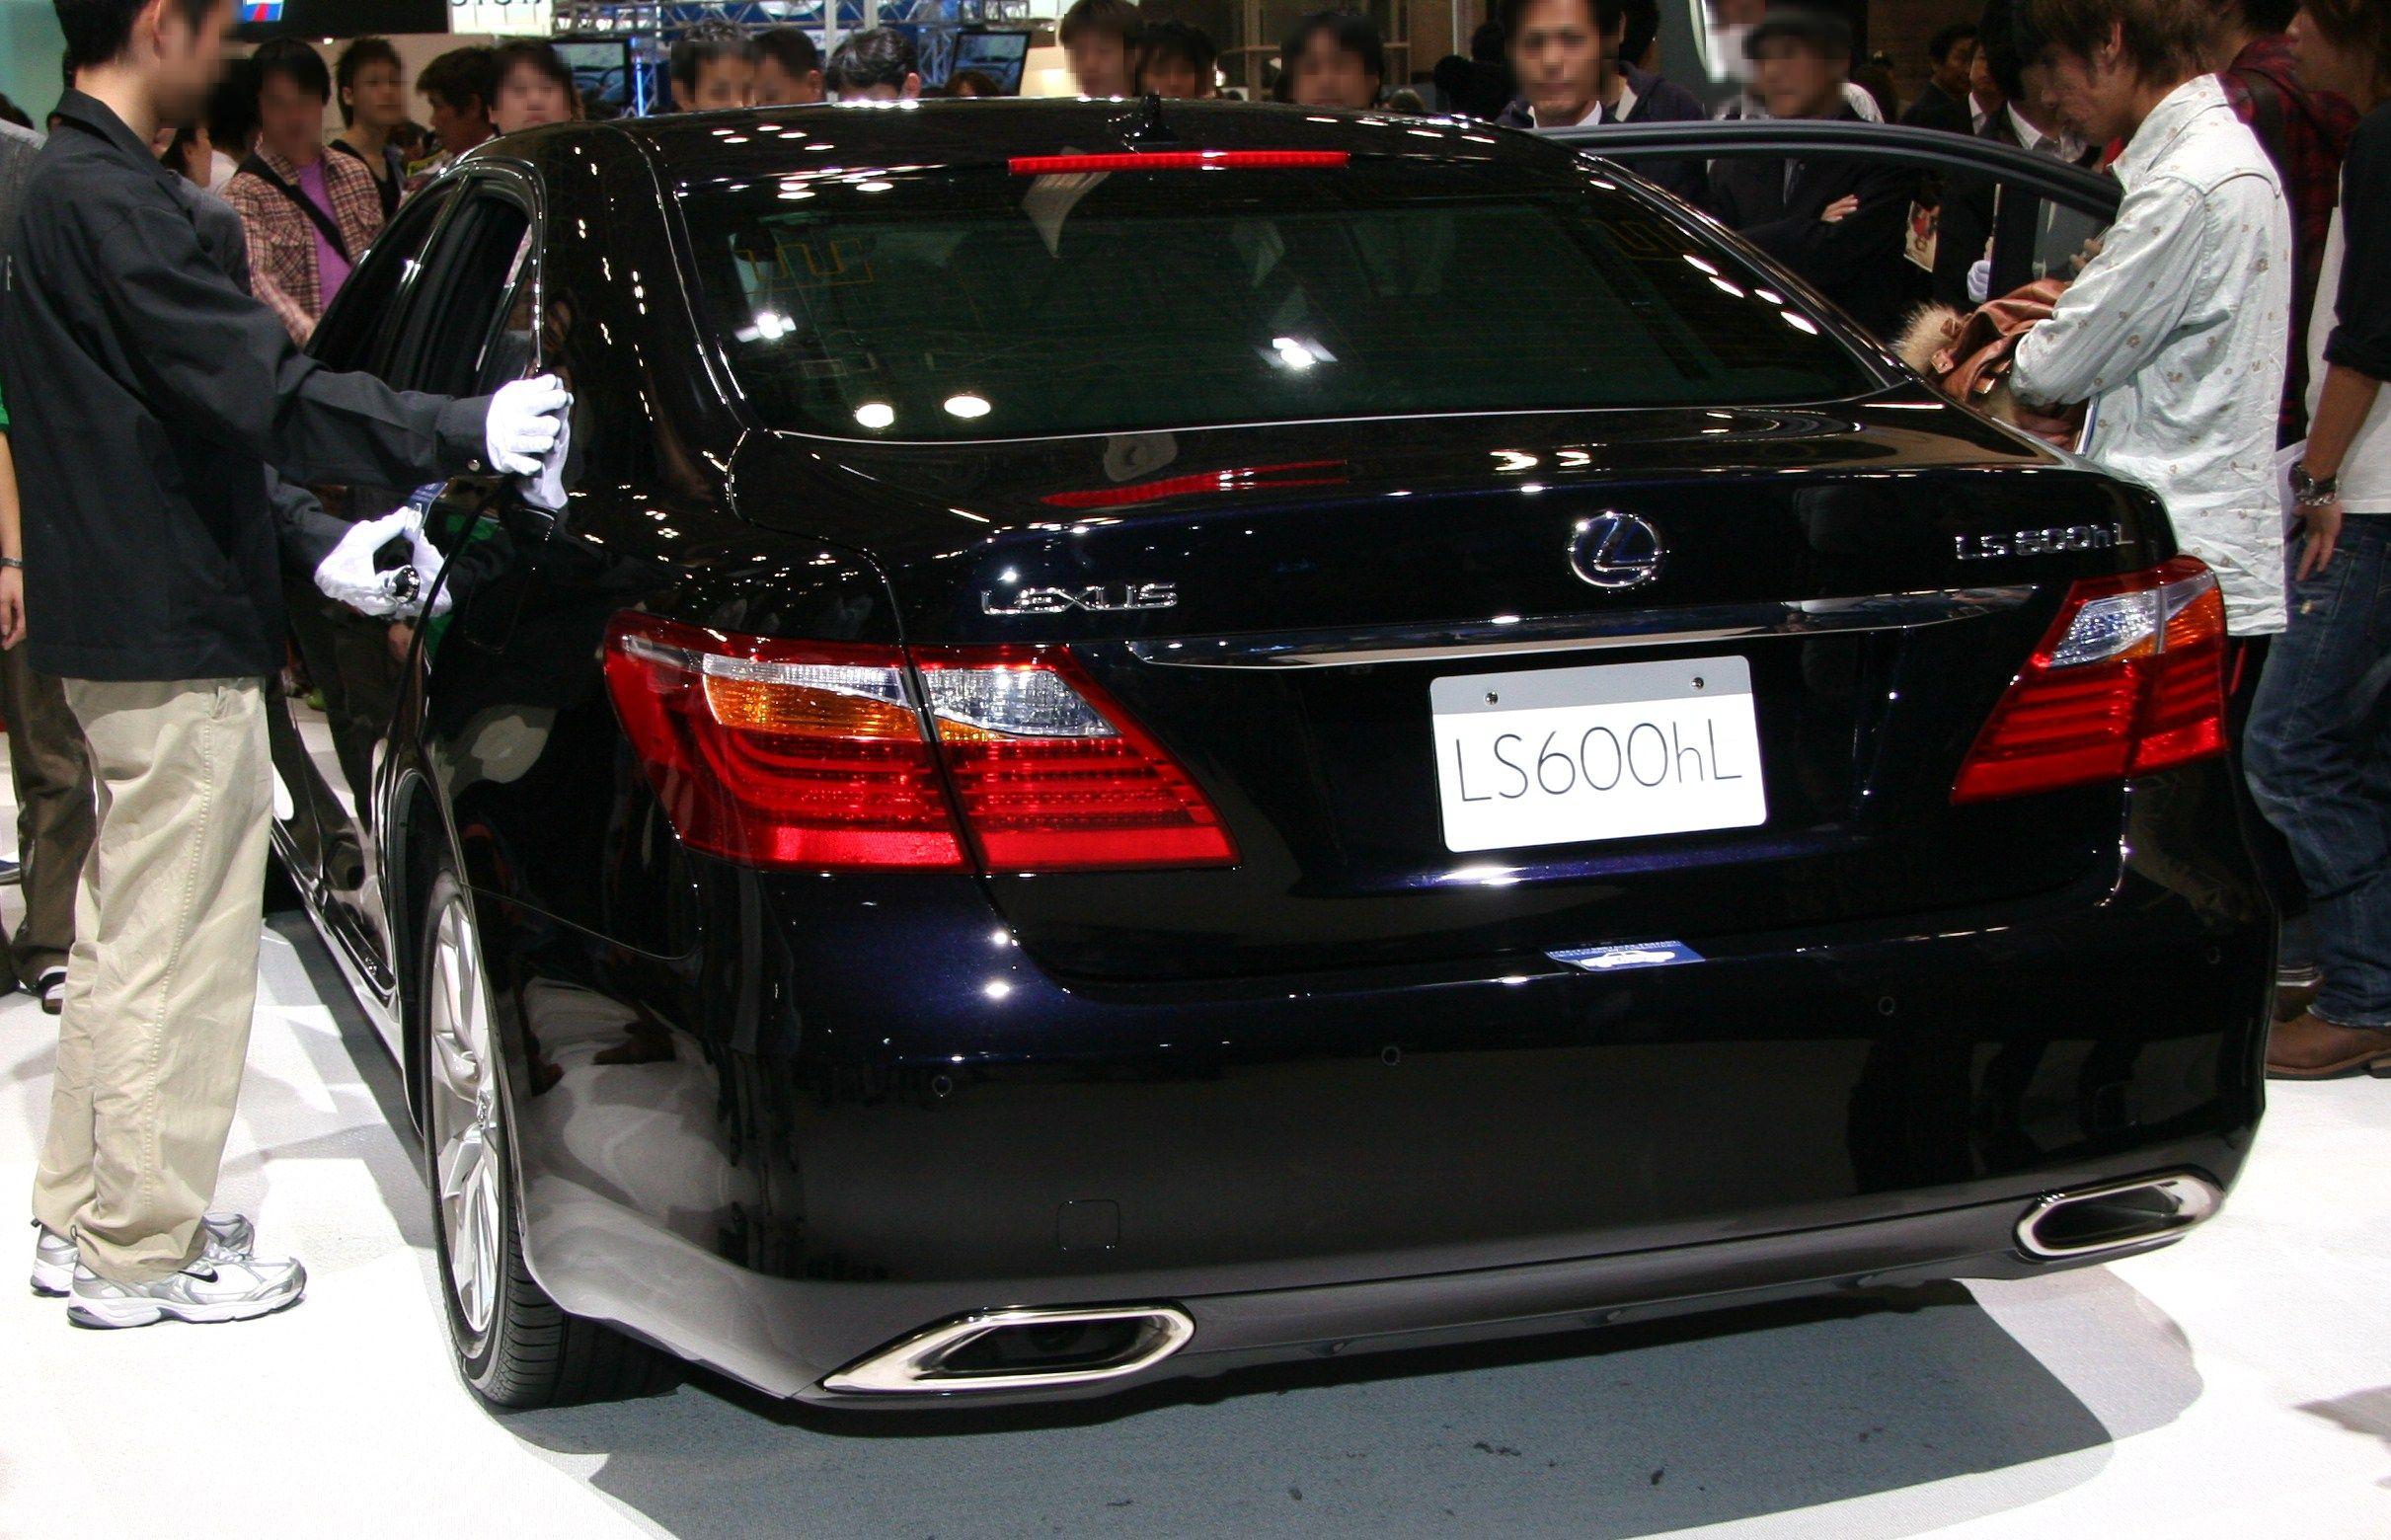 https://upload.wikimedia.org/wikipedia/commons/1/1e/2009_Lexus_LS600hL_rear.jpg